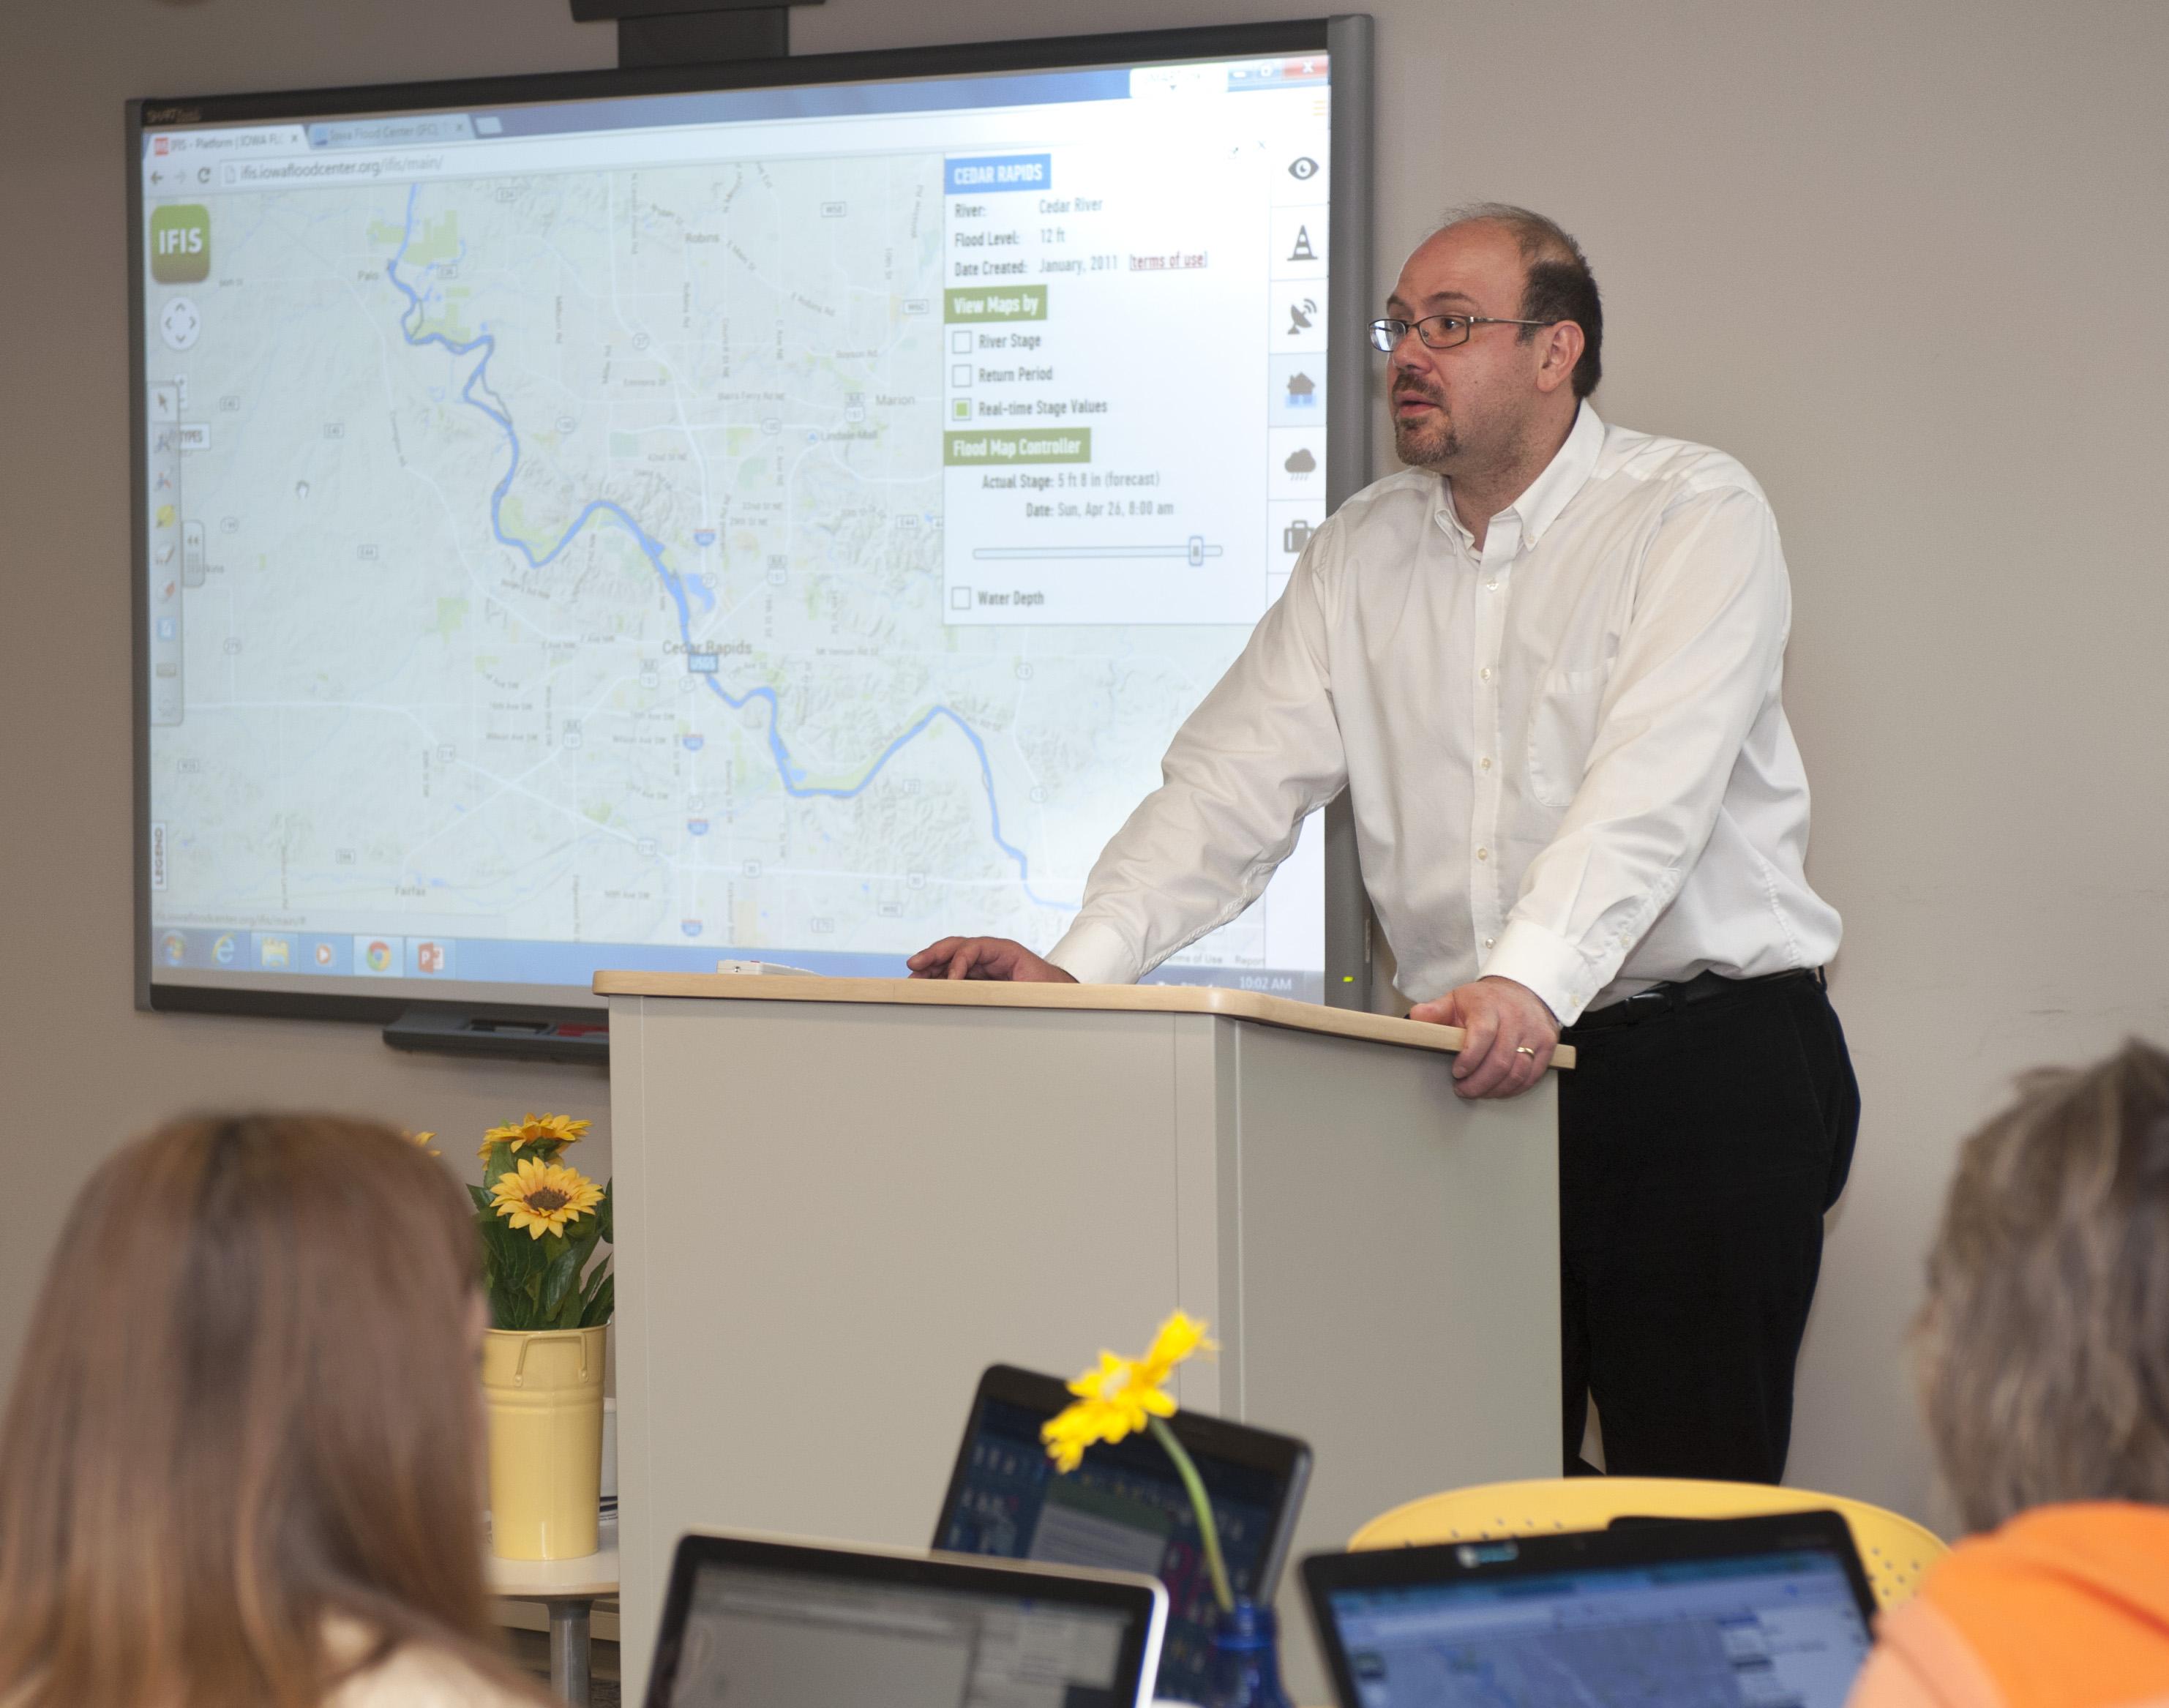 Gabriele Villarini gives a presentation using IFIS.